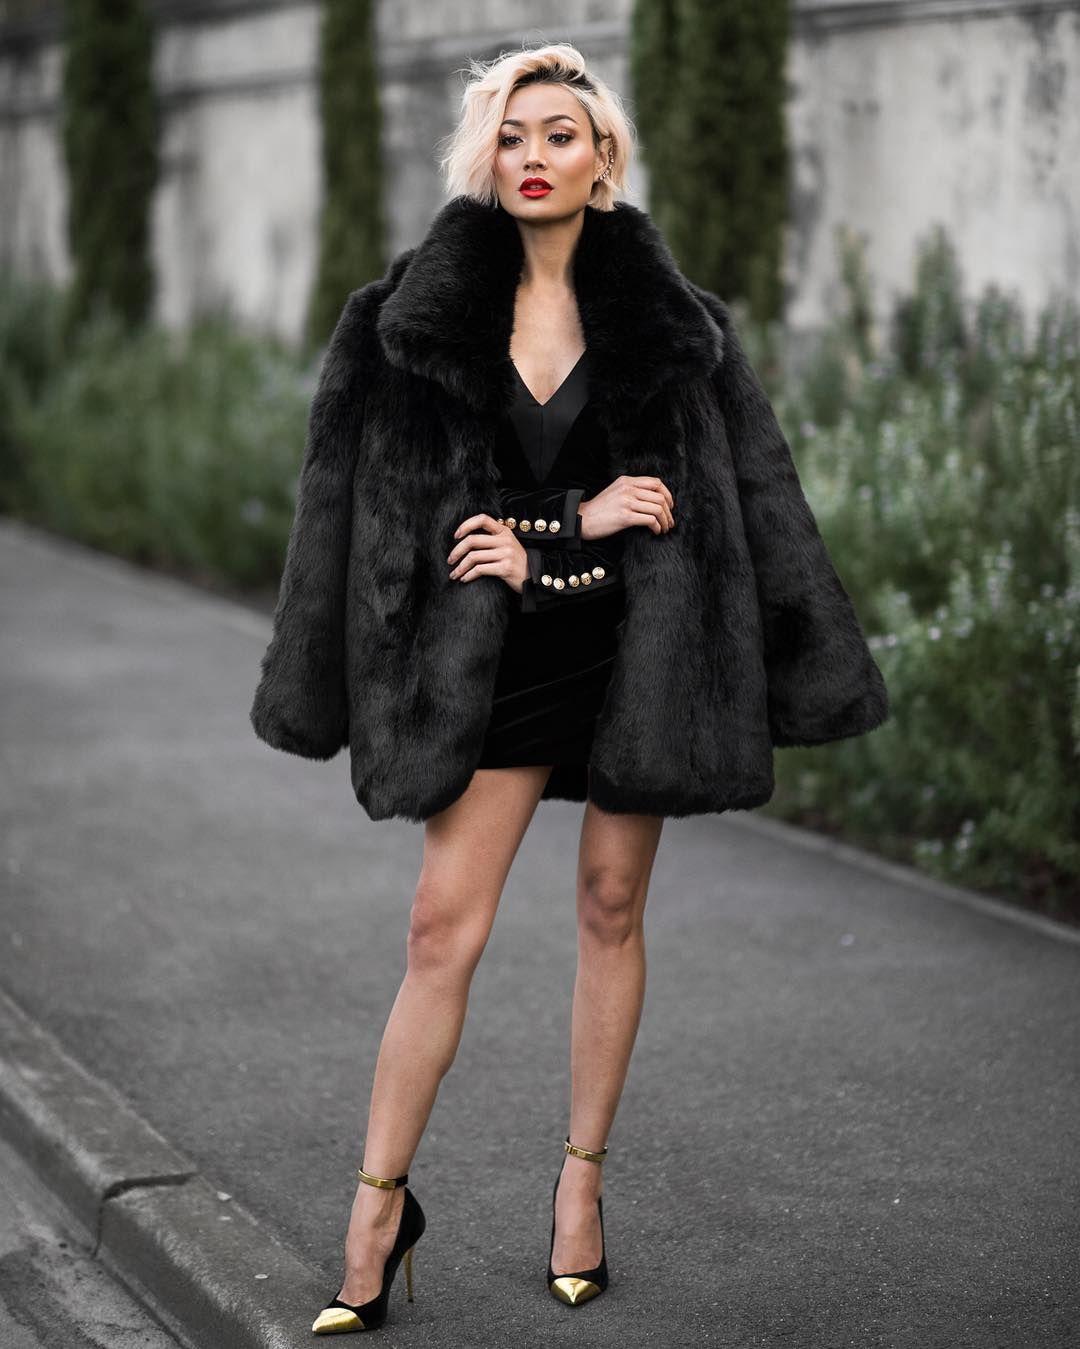 f191bbc1ebc Micah Gianneli - Cruella de Vil vibes ♤ Faux fur coat & dress by  @hausofsong #HausOfSong